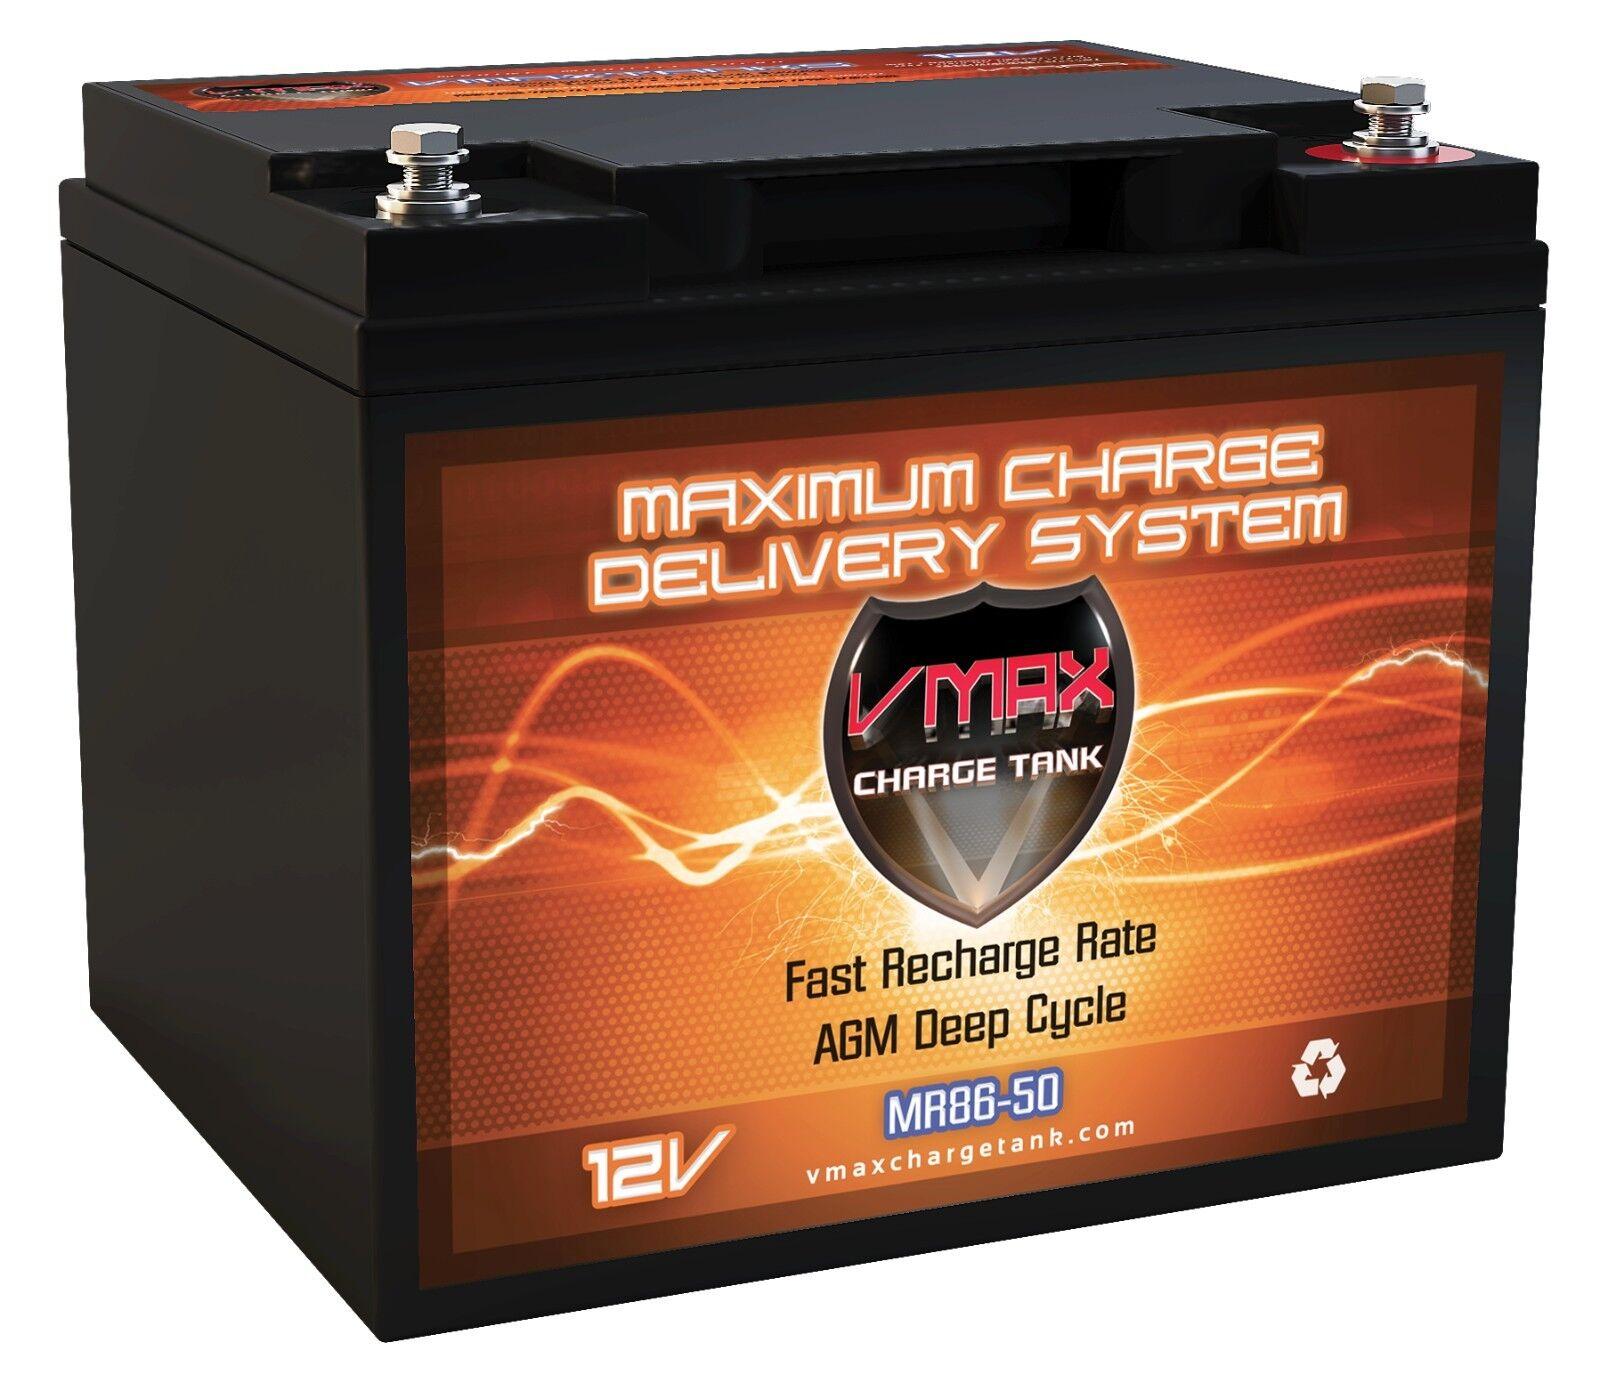 VMAX MR86-50 12 Volt 50AH AGM DEEP CYCLE MARINE AGM SLA DRY